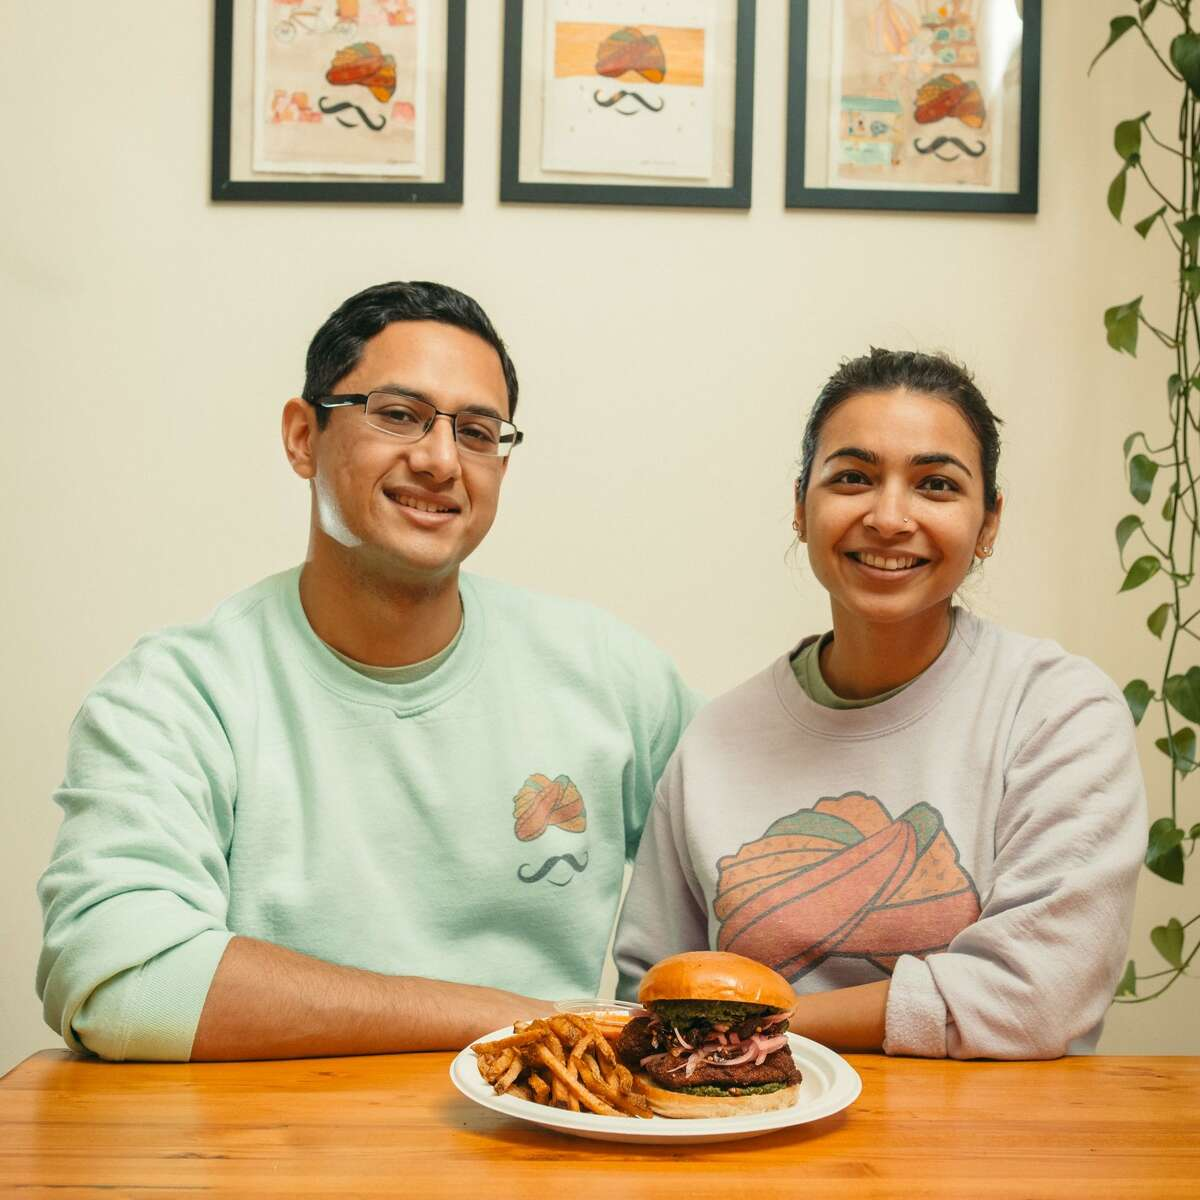 Gully Sandwich from Aakanksha Sinha and Uttam Mukherjee of Spice Waala